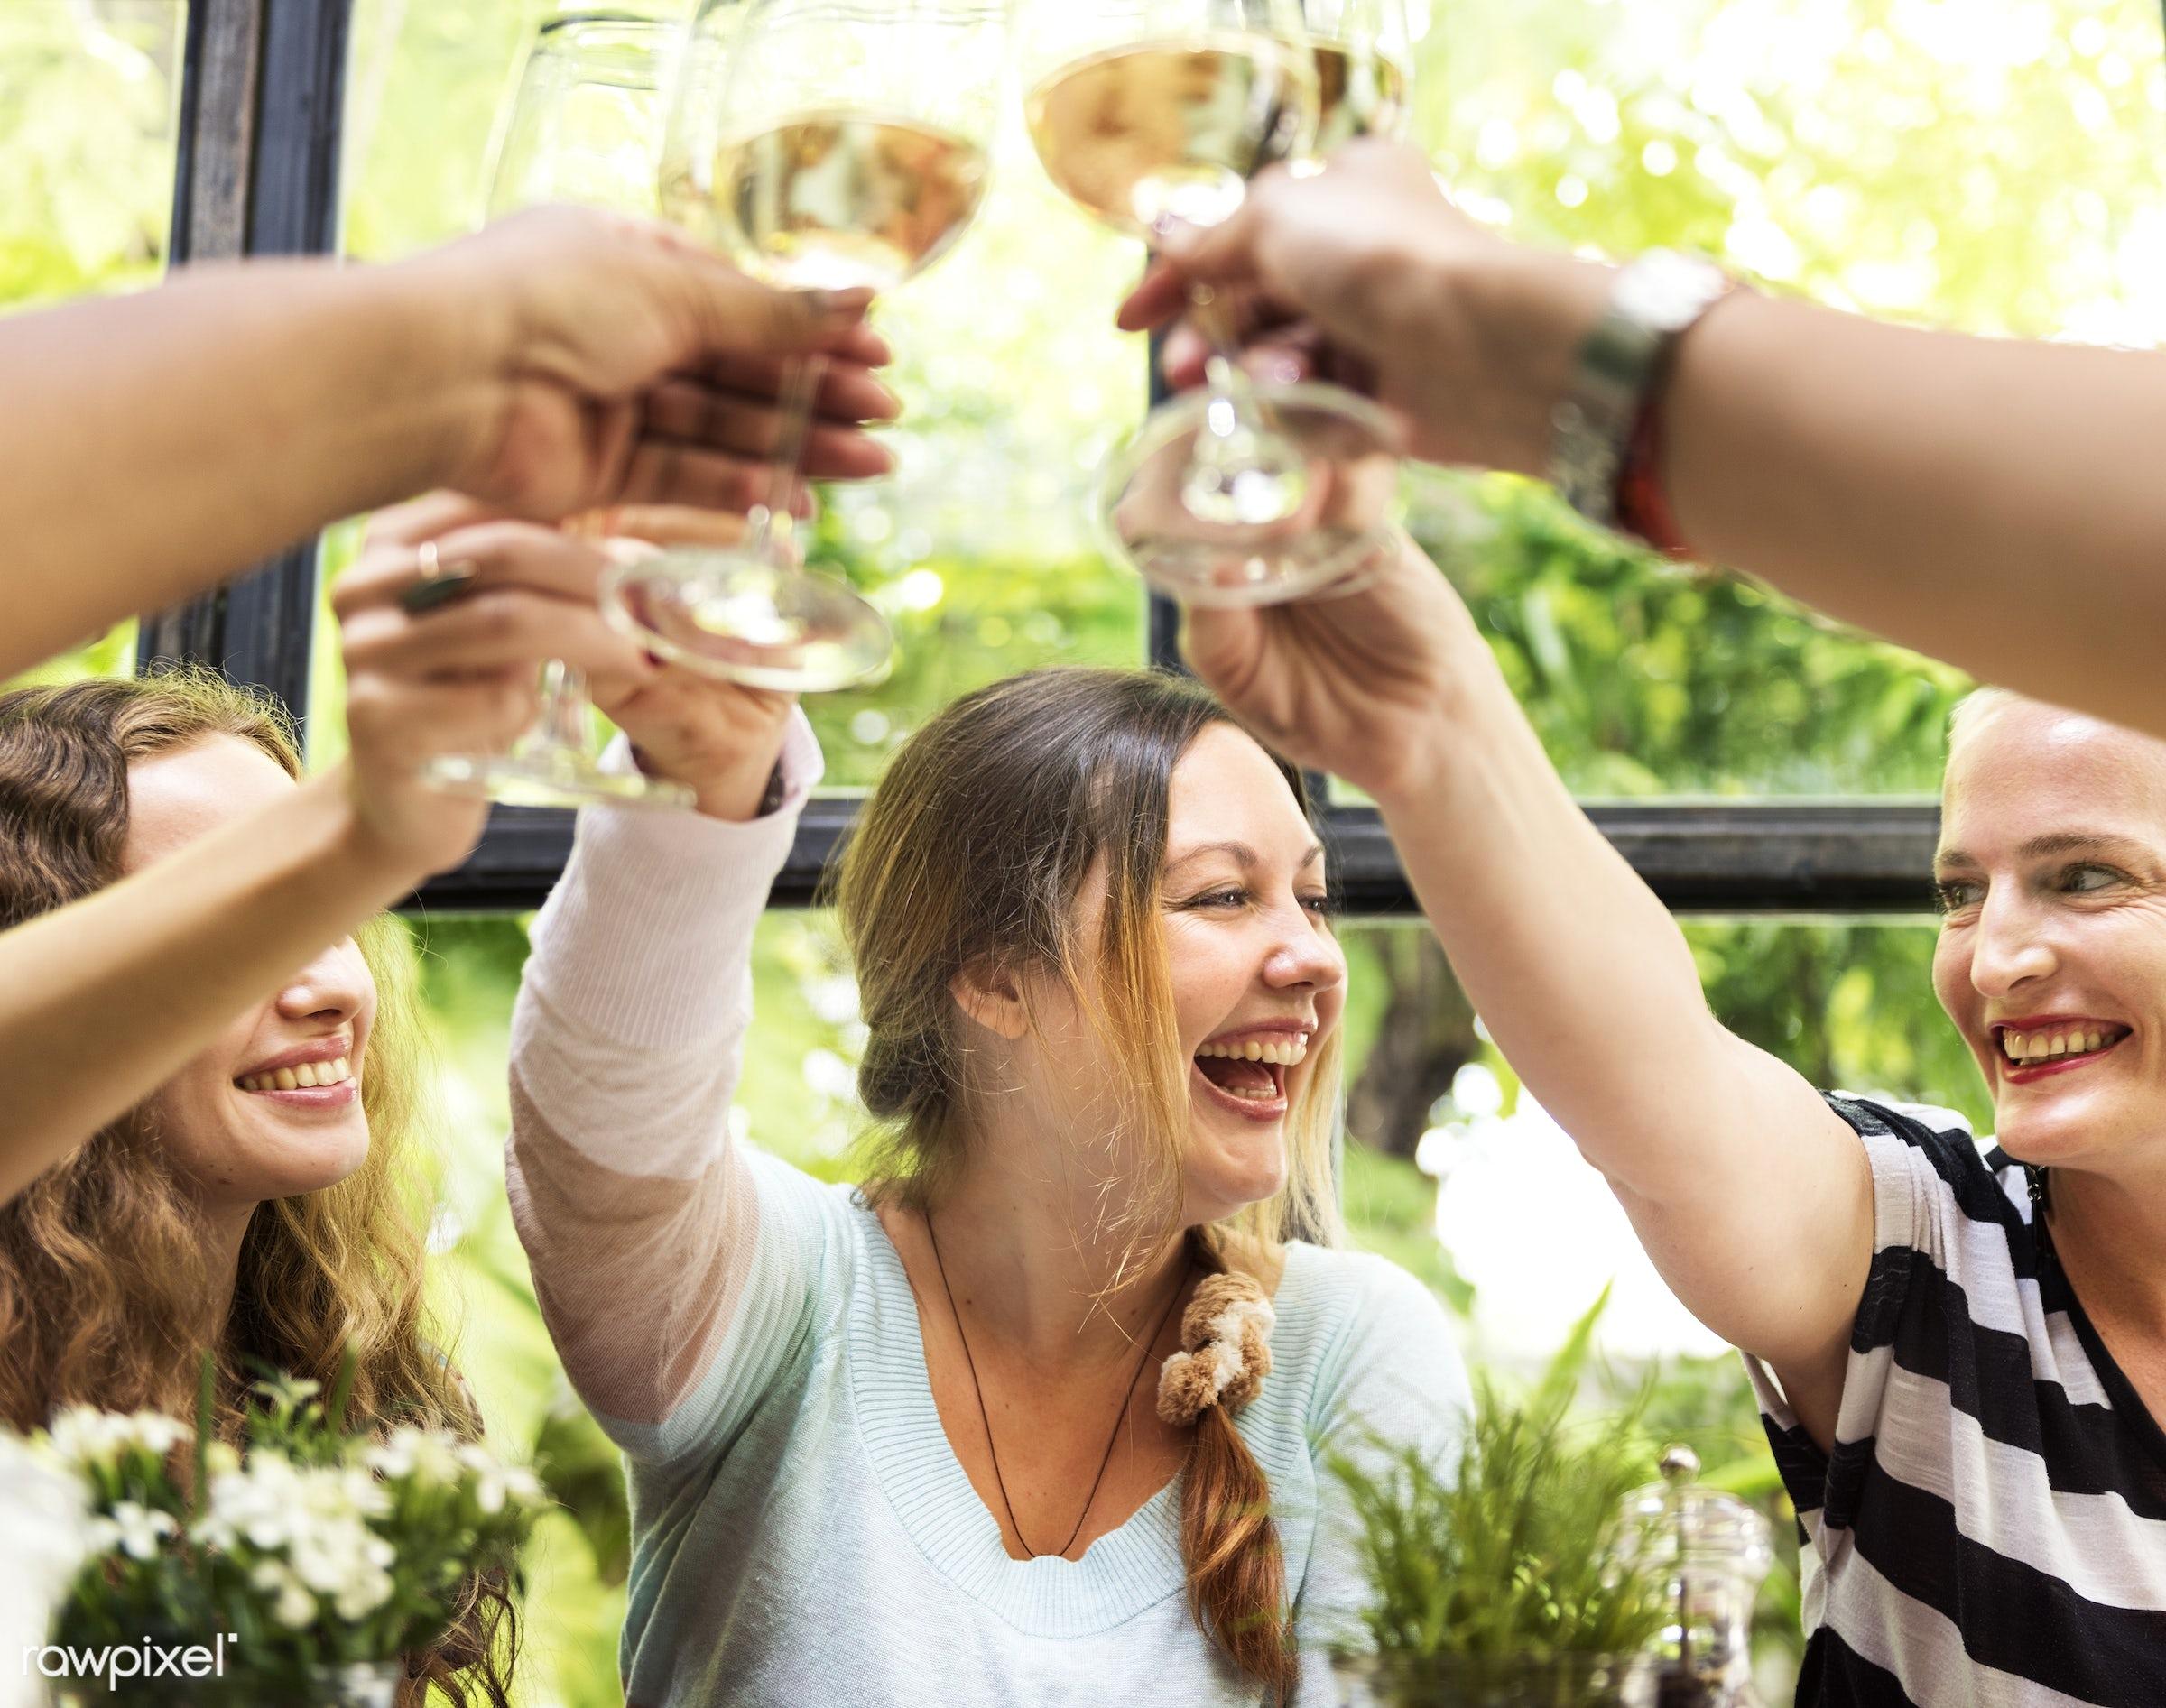 Women celebrating with wine - adult, african descent, bonding, bright, brunch, cafe, casual, celebrating, celebration,...